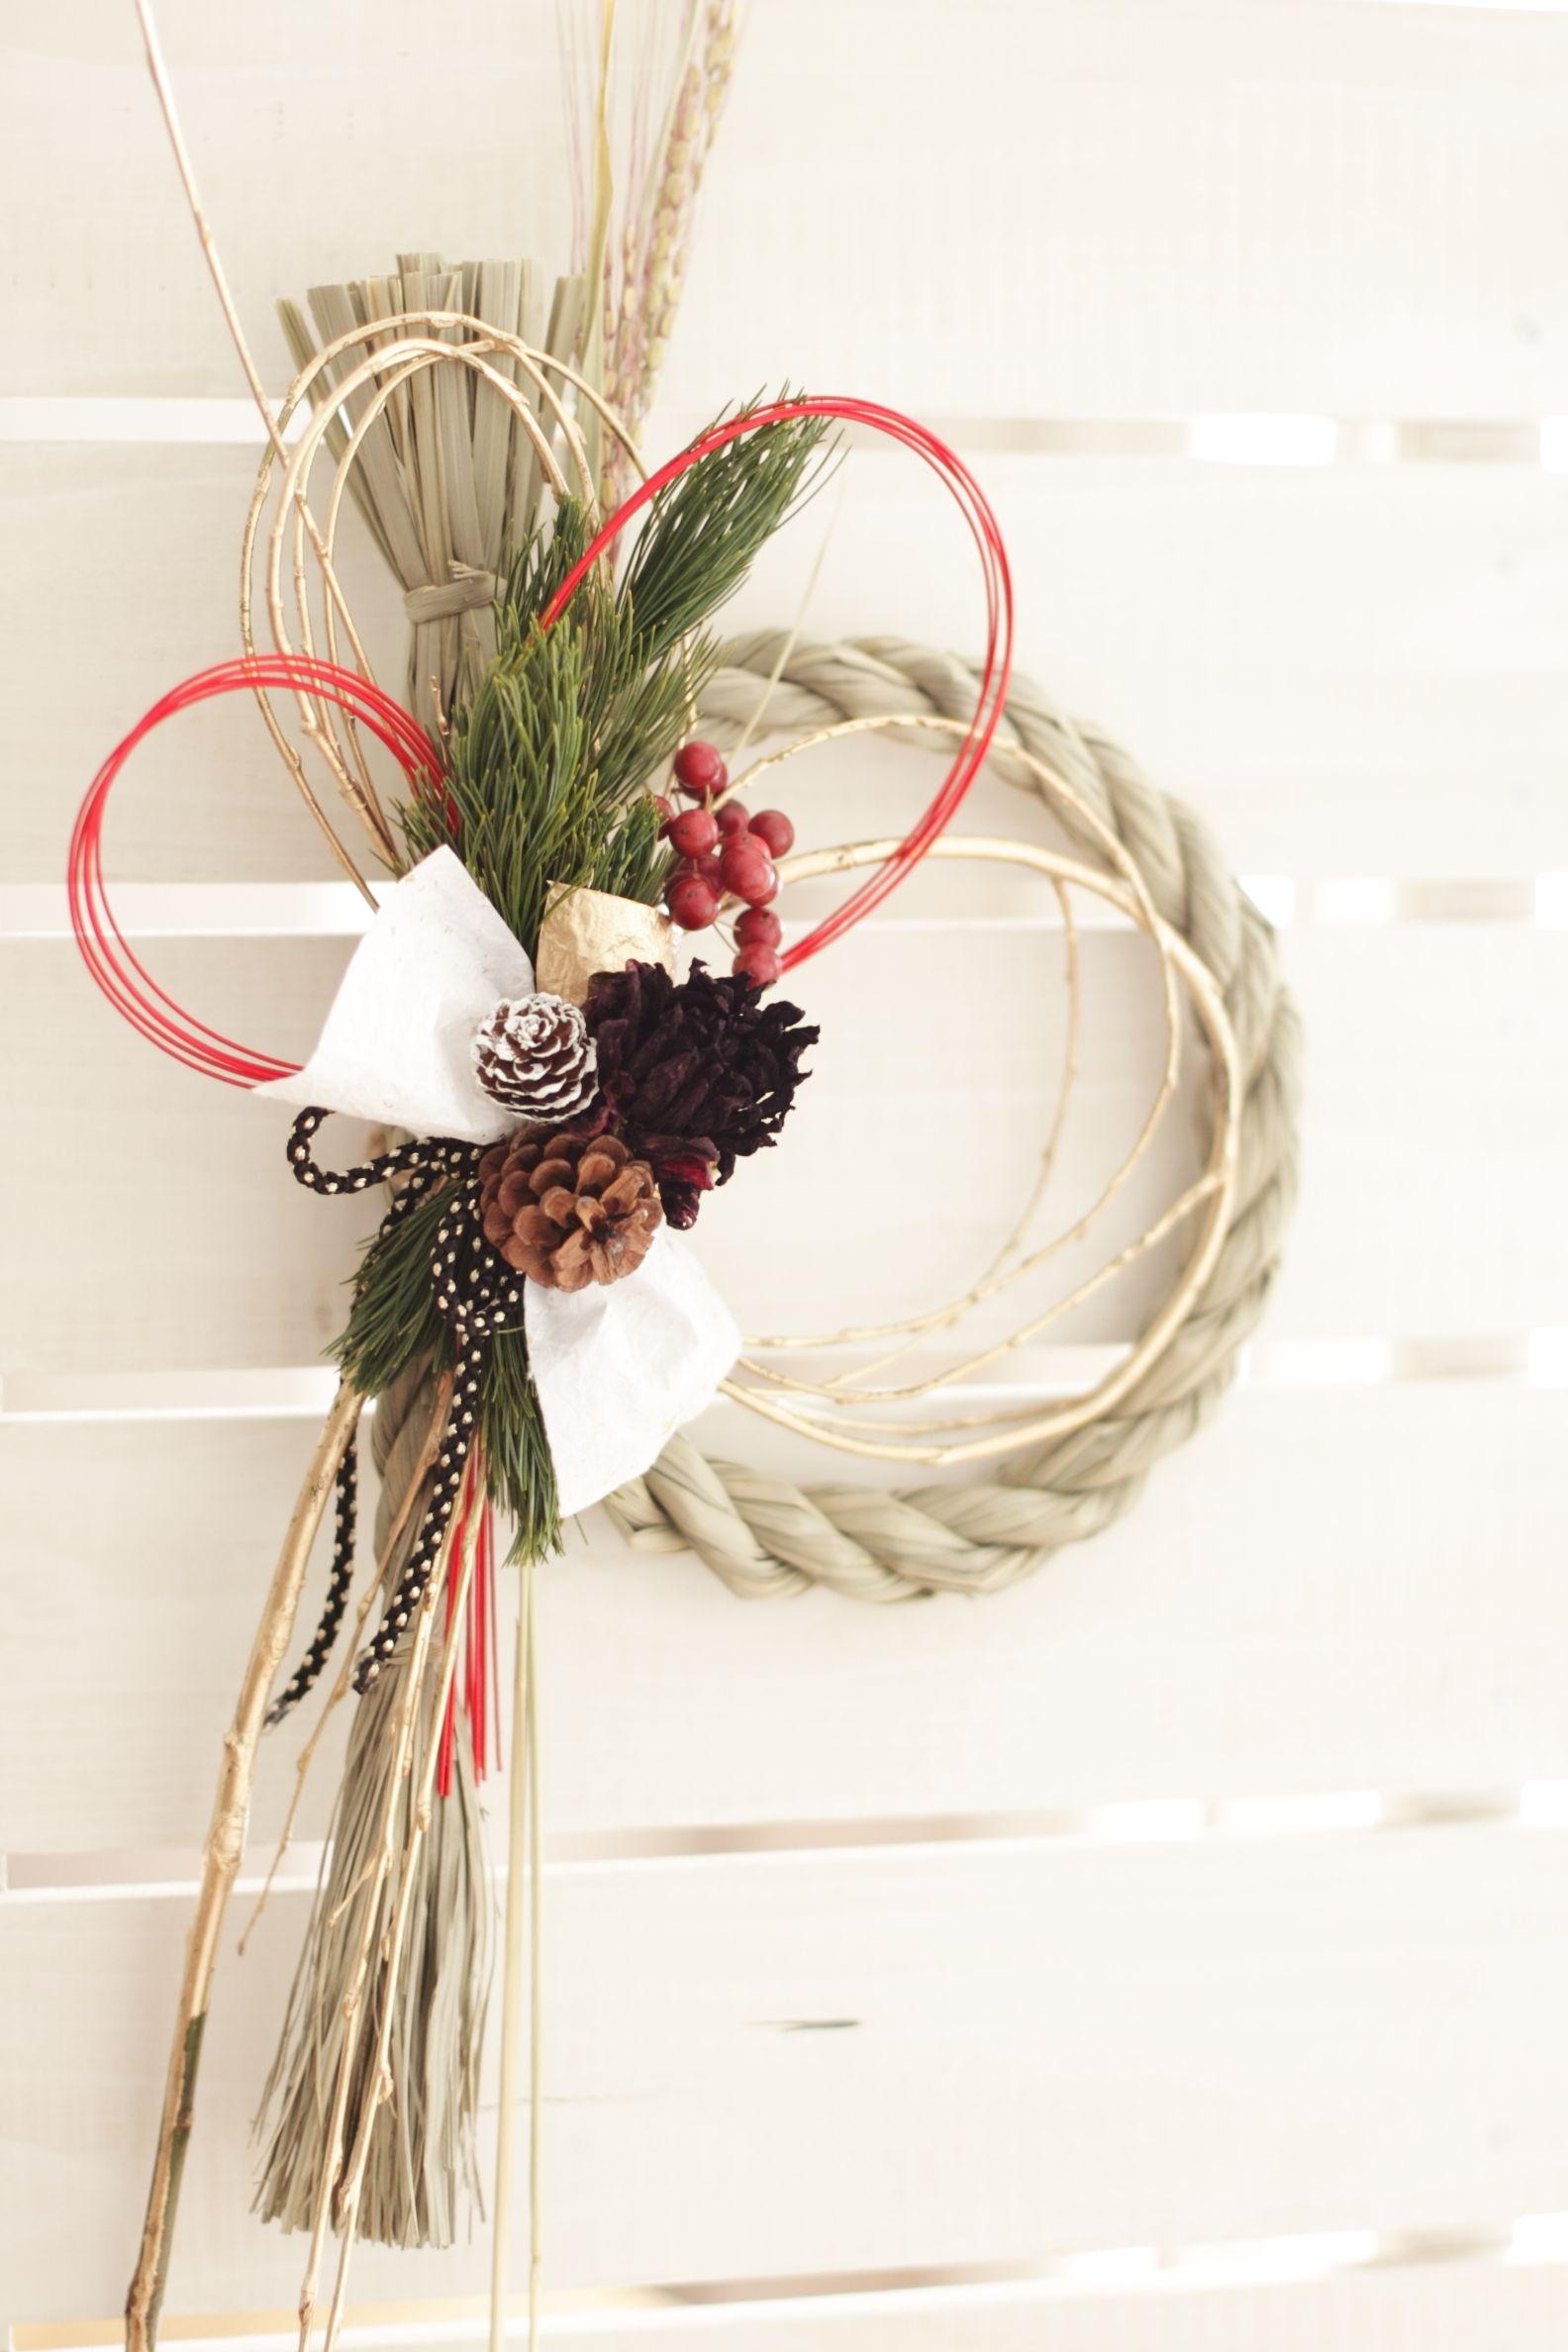 Japanese New Year decoration お正月 飾り リース, お正月 ディスプレイ, お正月 飾り